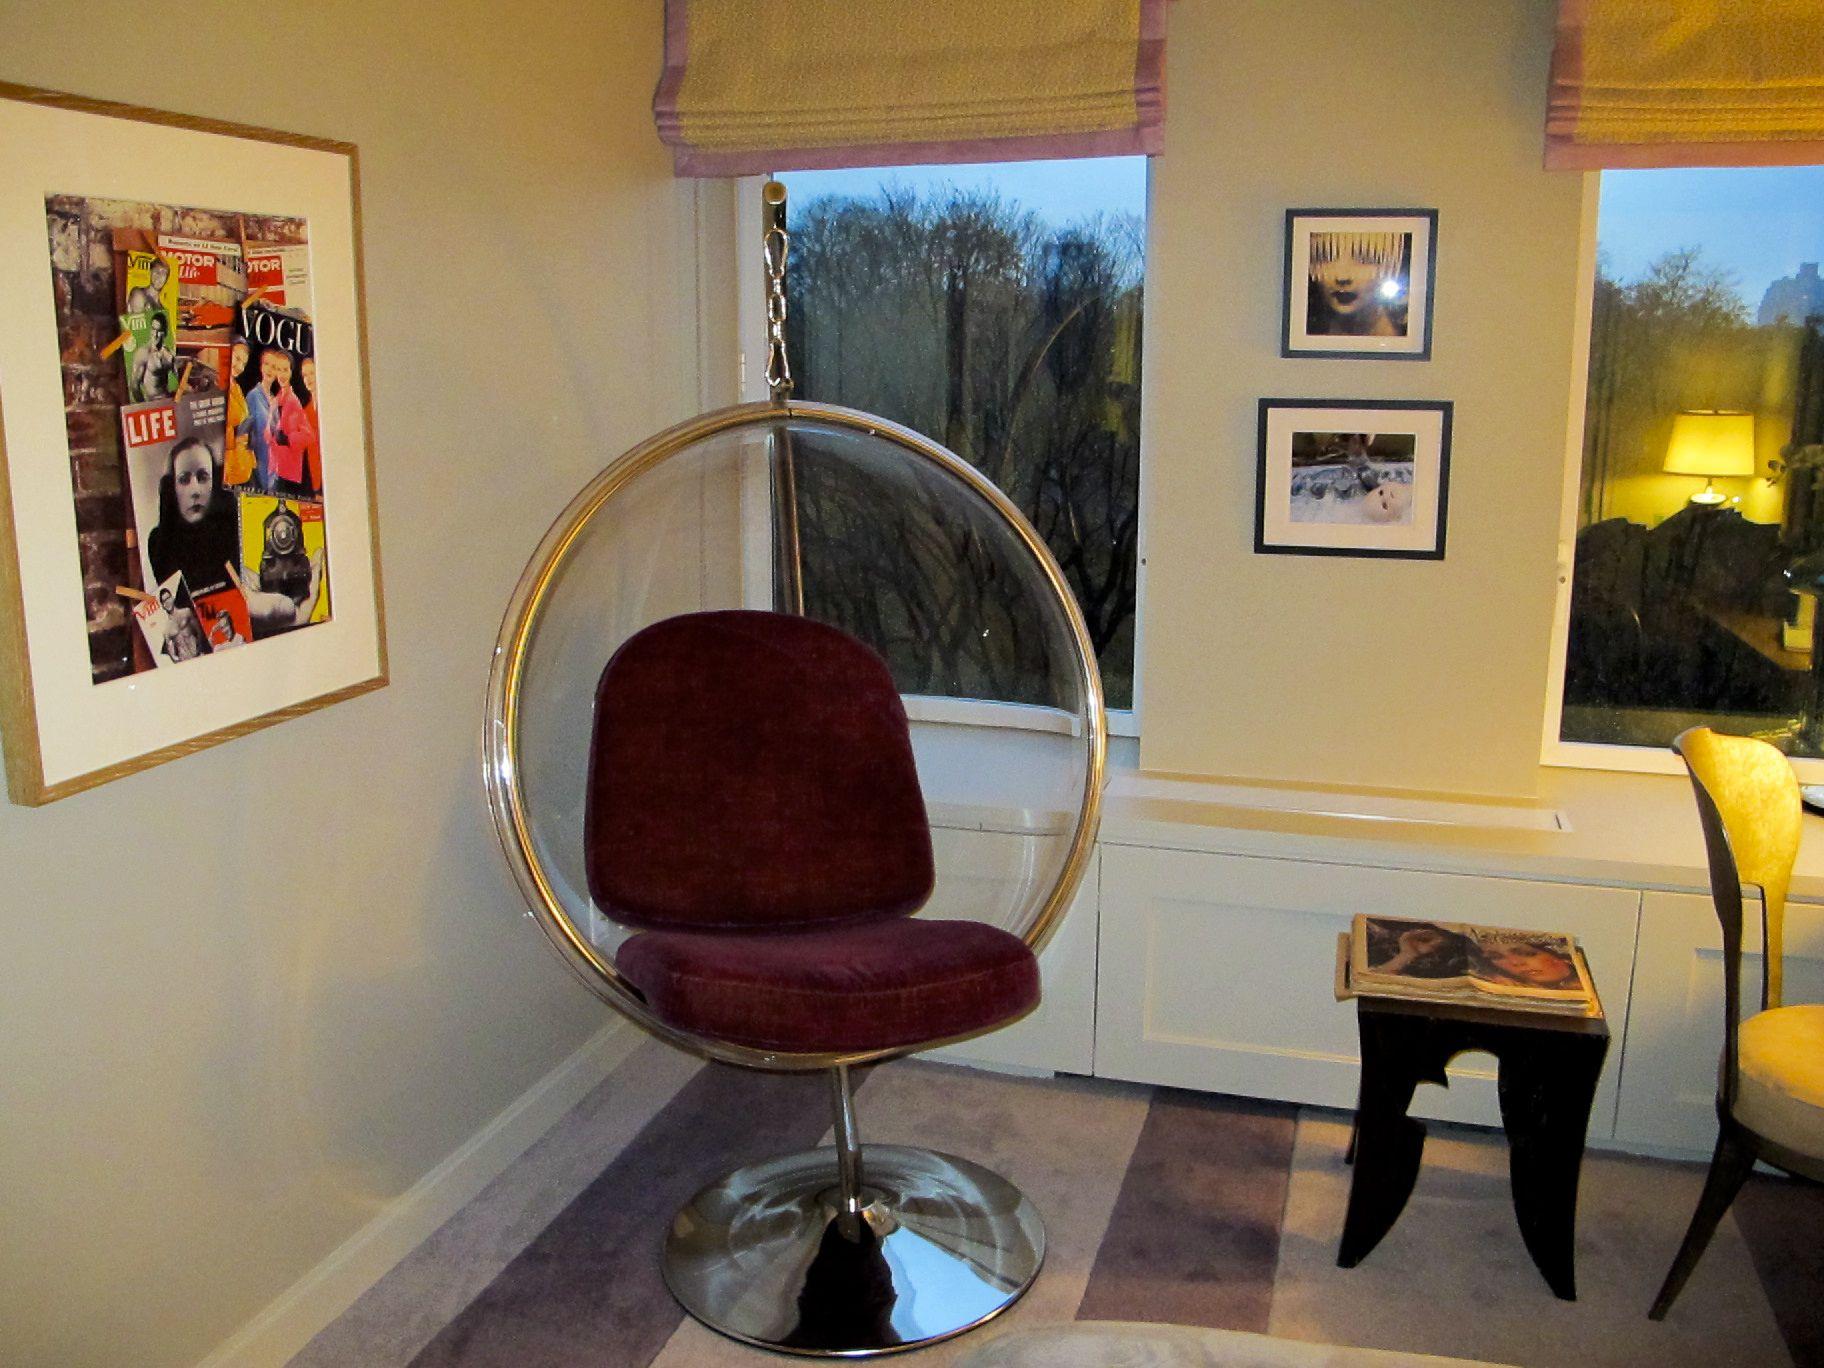 College Game Room Furniture